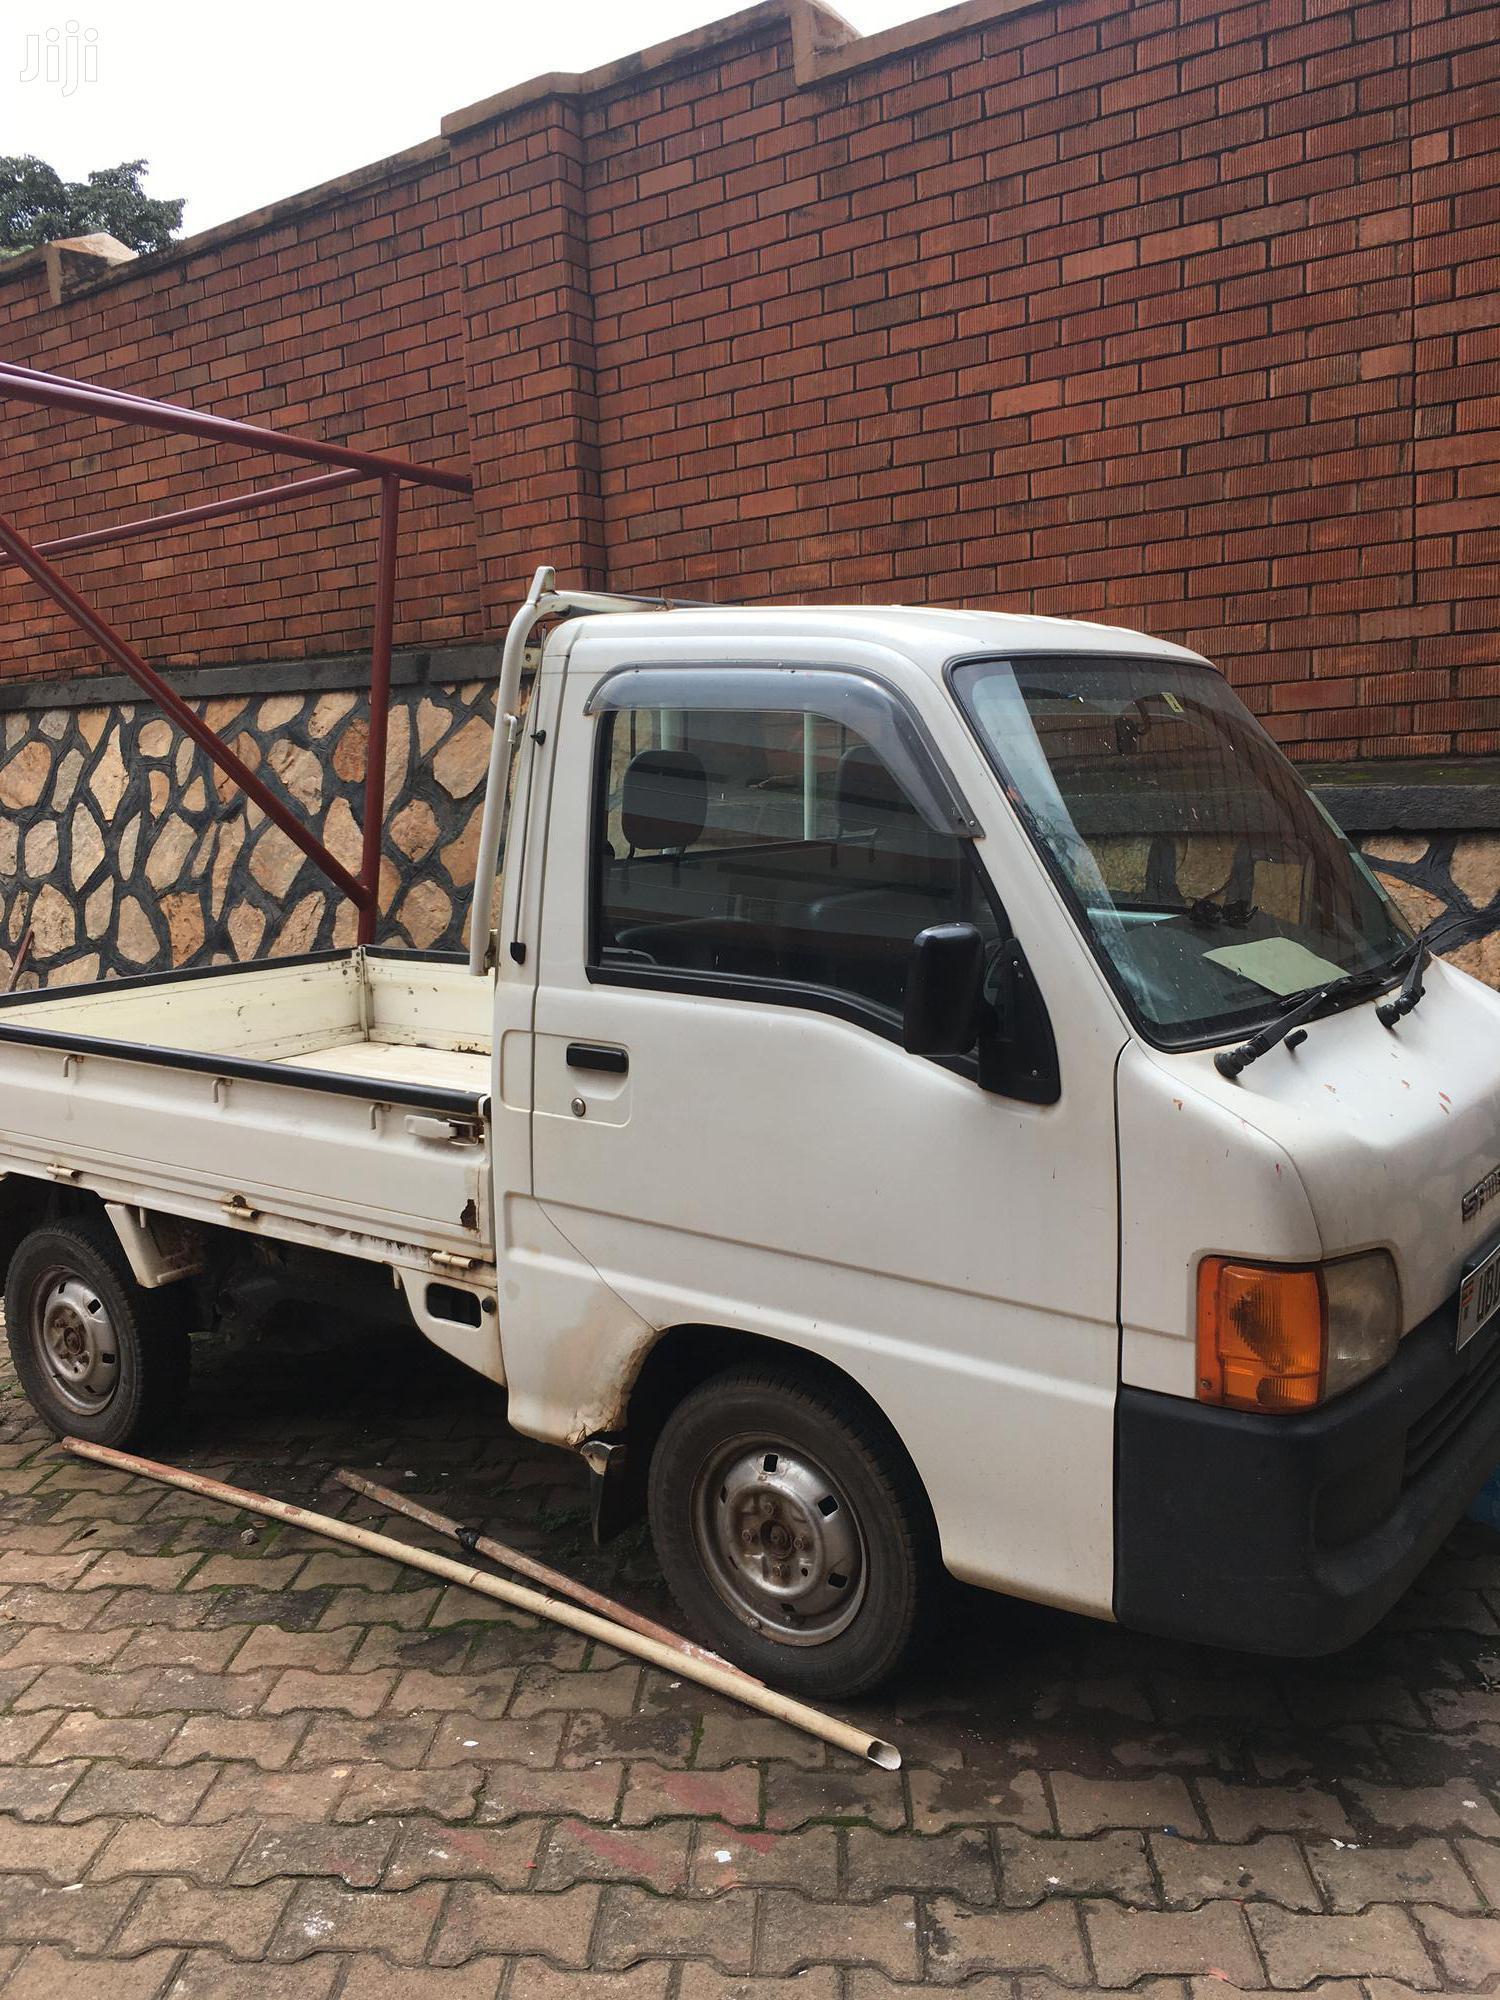 Archive: Subaru Sambar Kei Truck For Sale